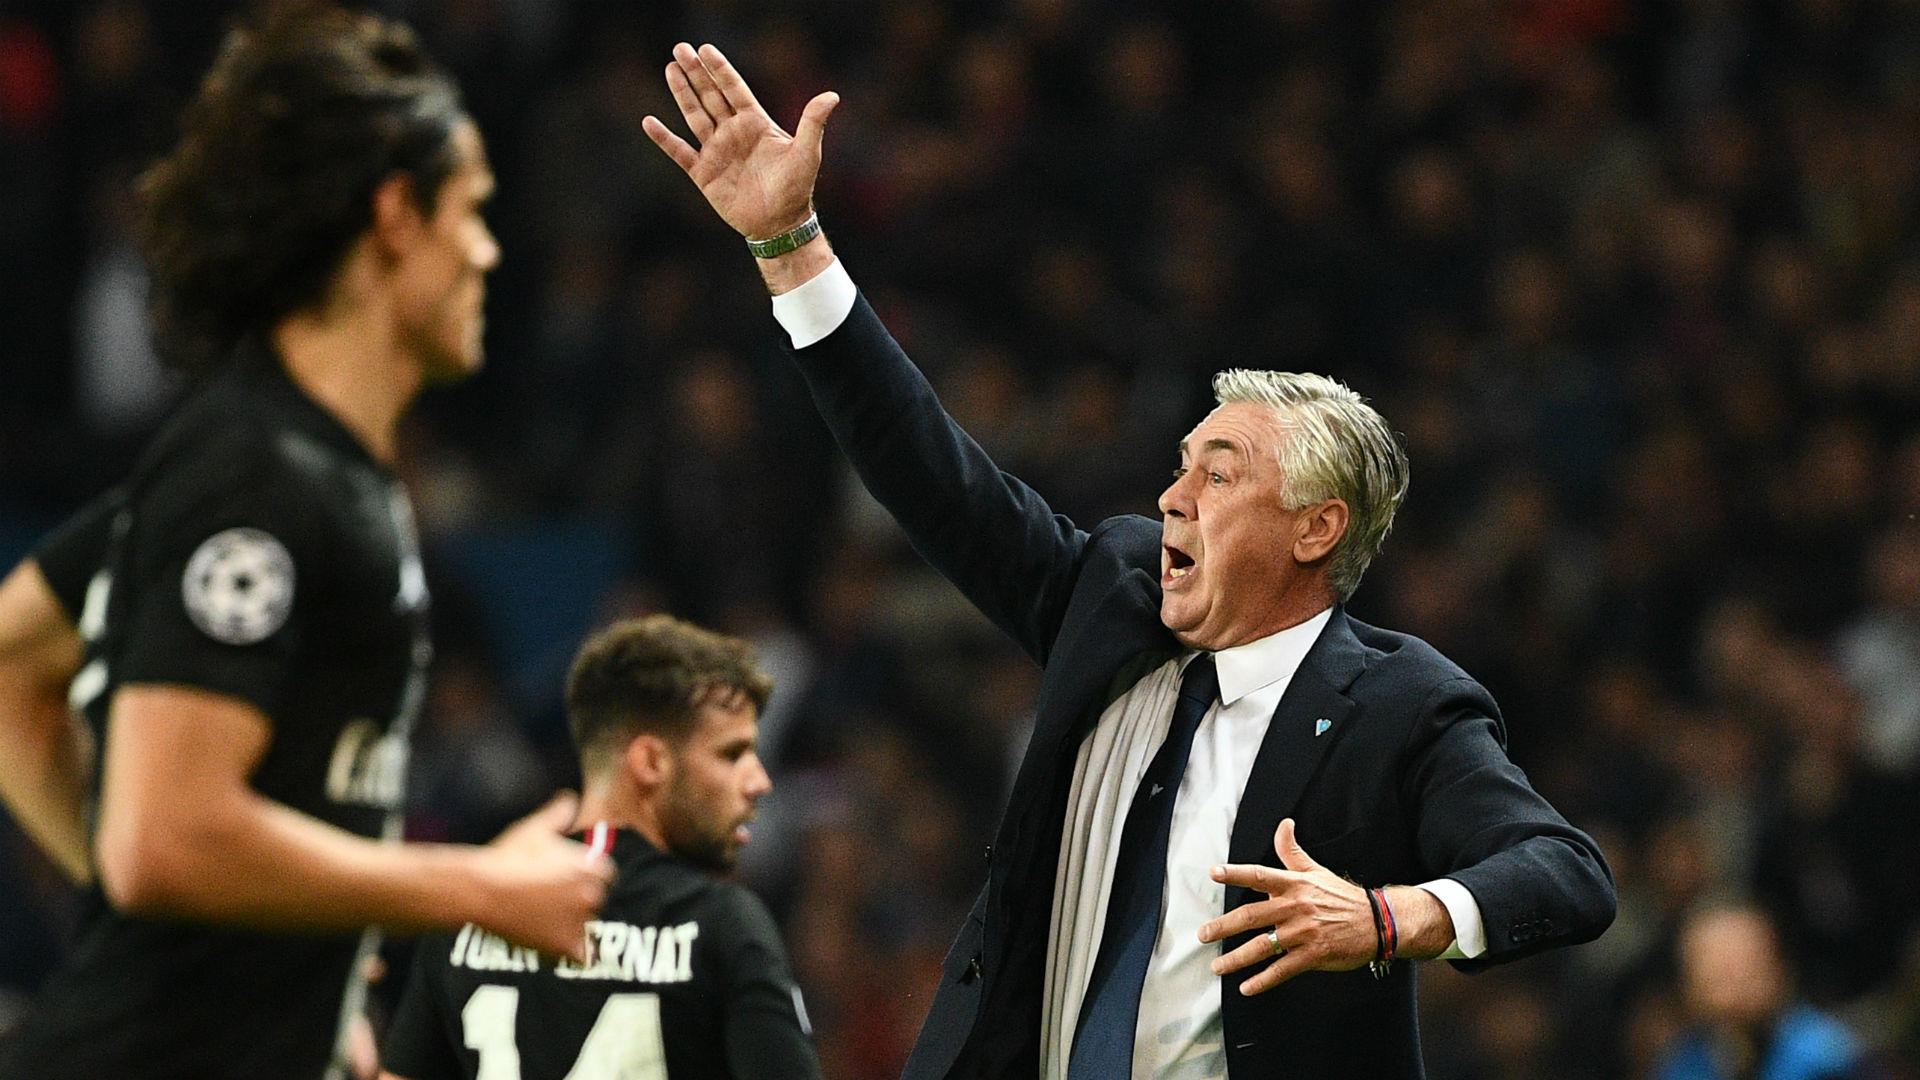 Carlo Ancelotti PSG Napoli UEFA Champions League 24102018